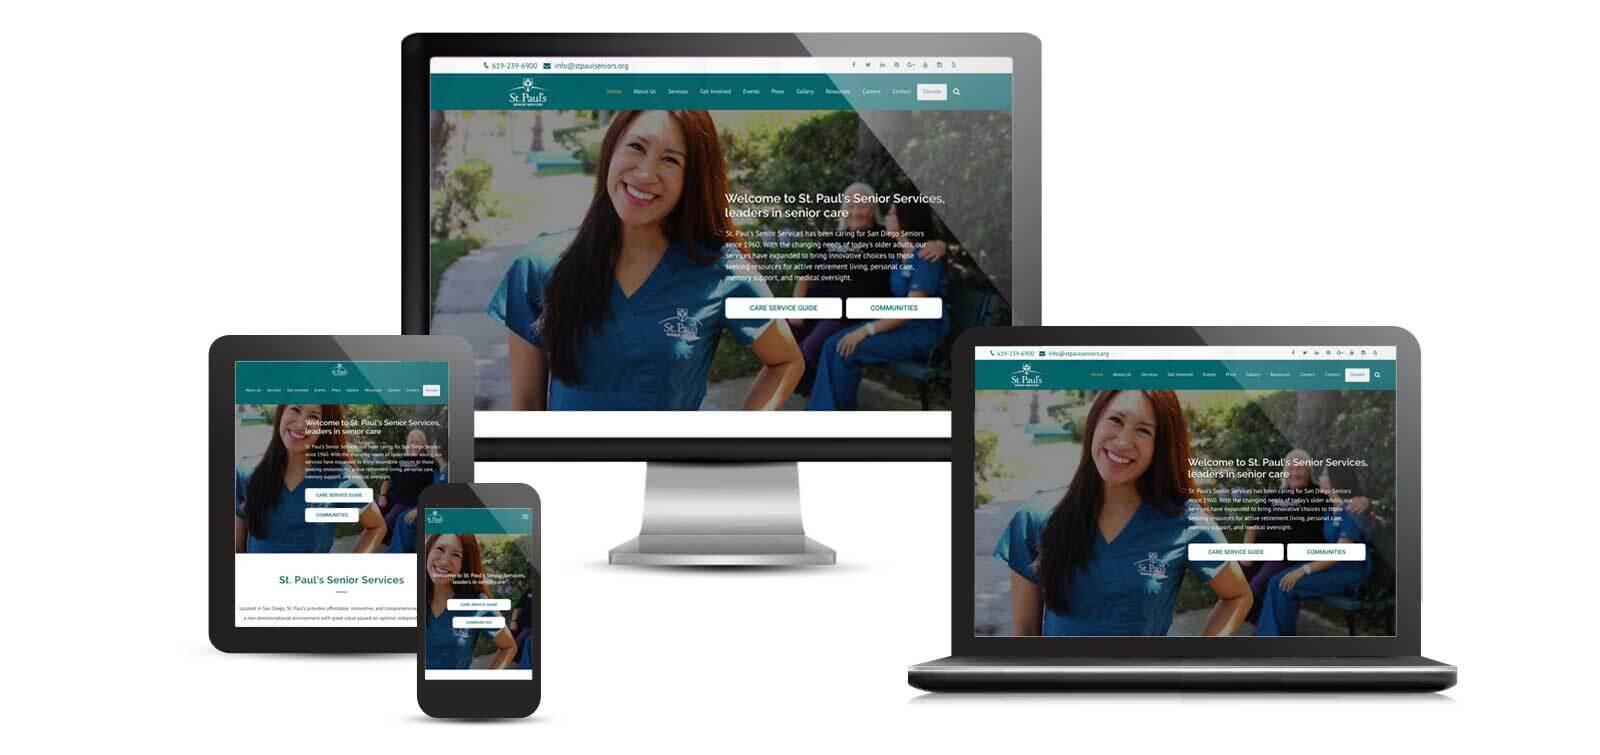 Idea adult design services site web